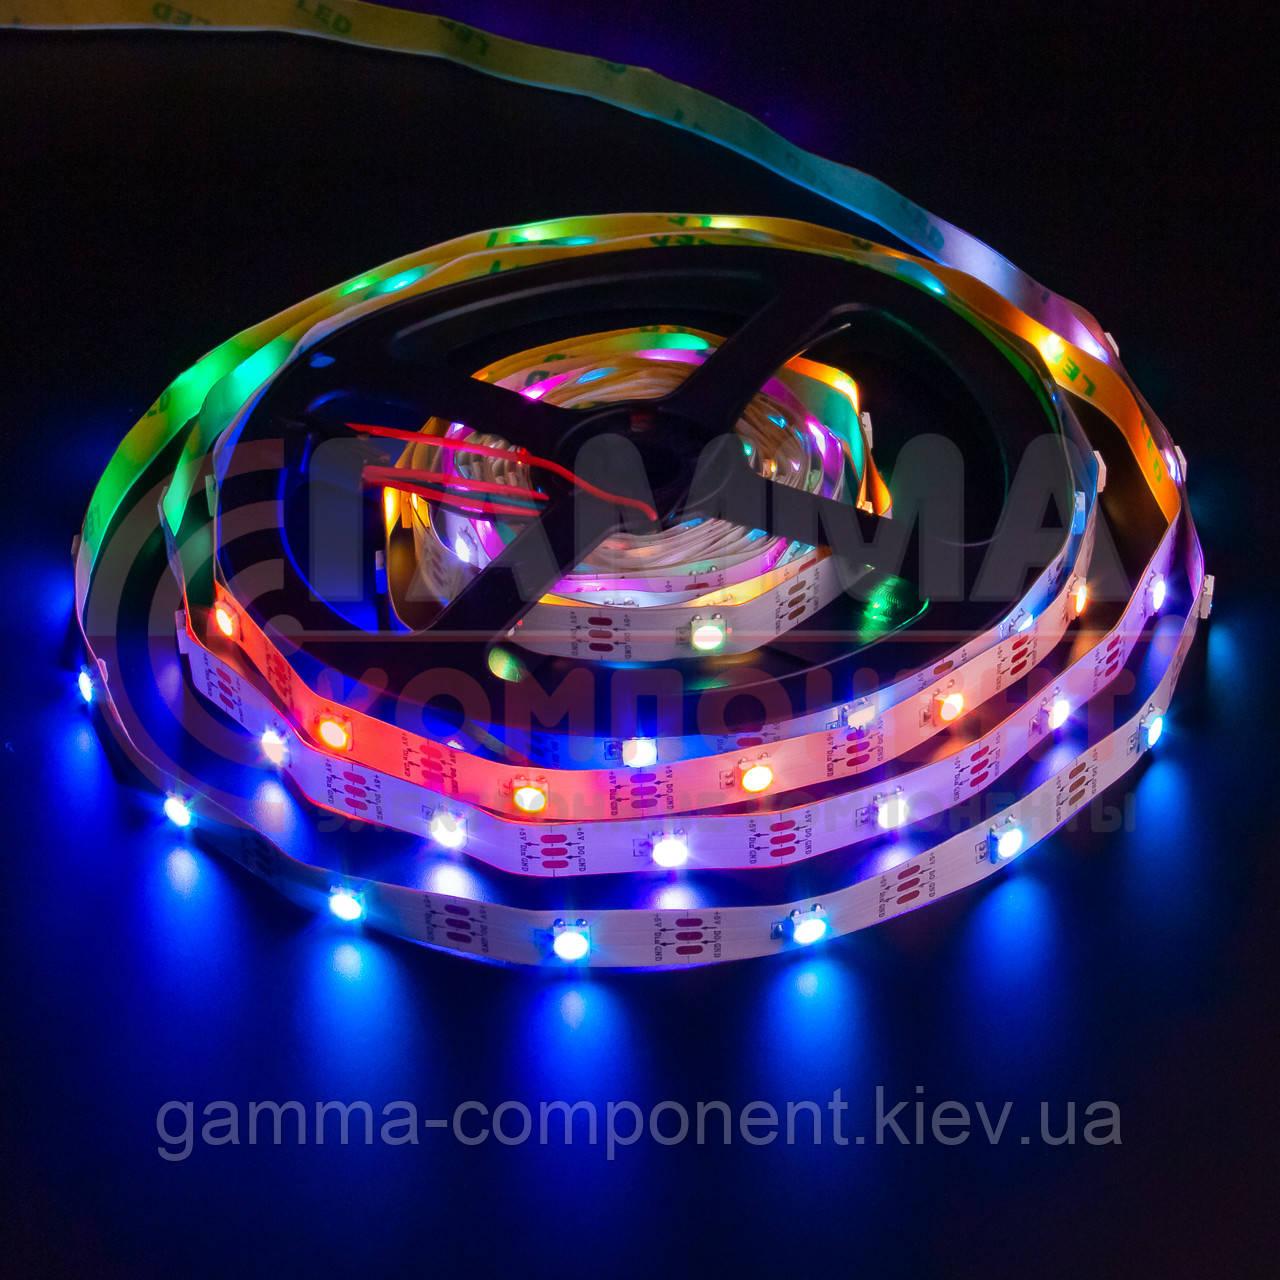 Адресная светодиодная лента AVT PROFESSIONAL SMD 5050 WS2812B (30 LED/m), IP20, 5B - бобины от 5 метров.